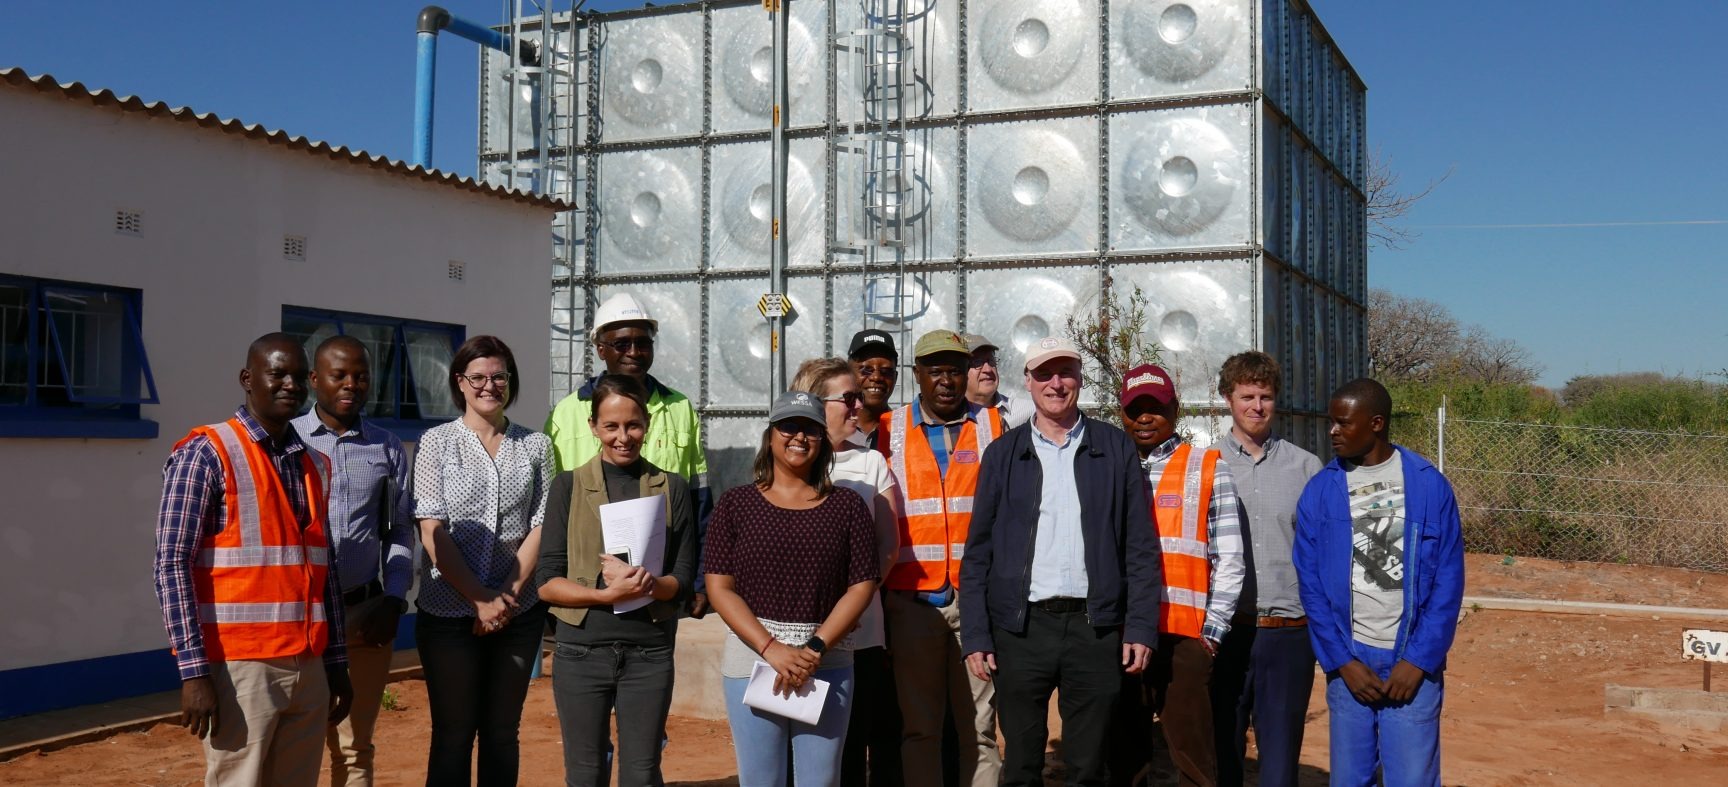 Bridging the gap in Zambia's water network